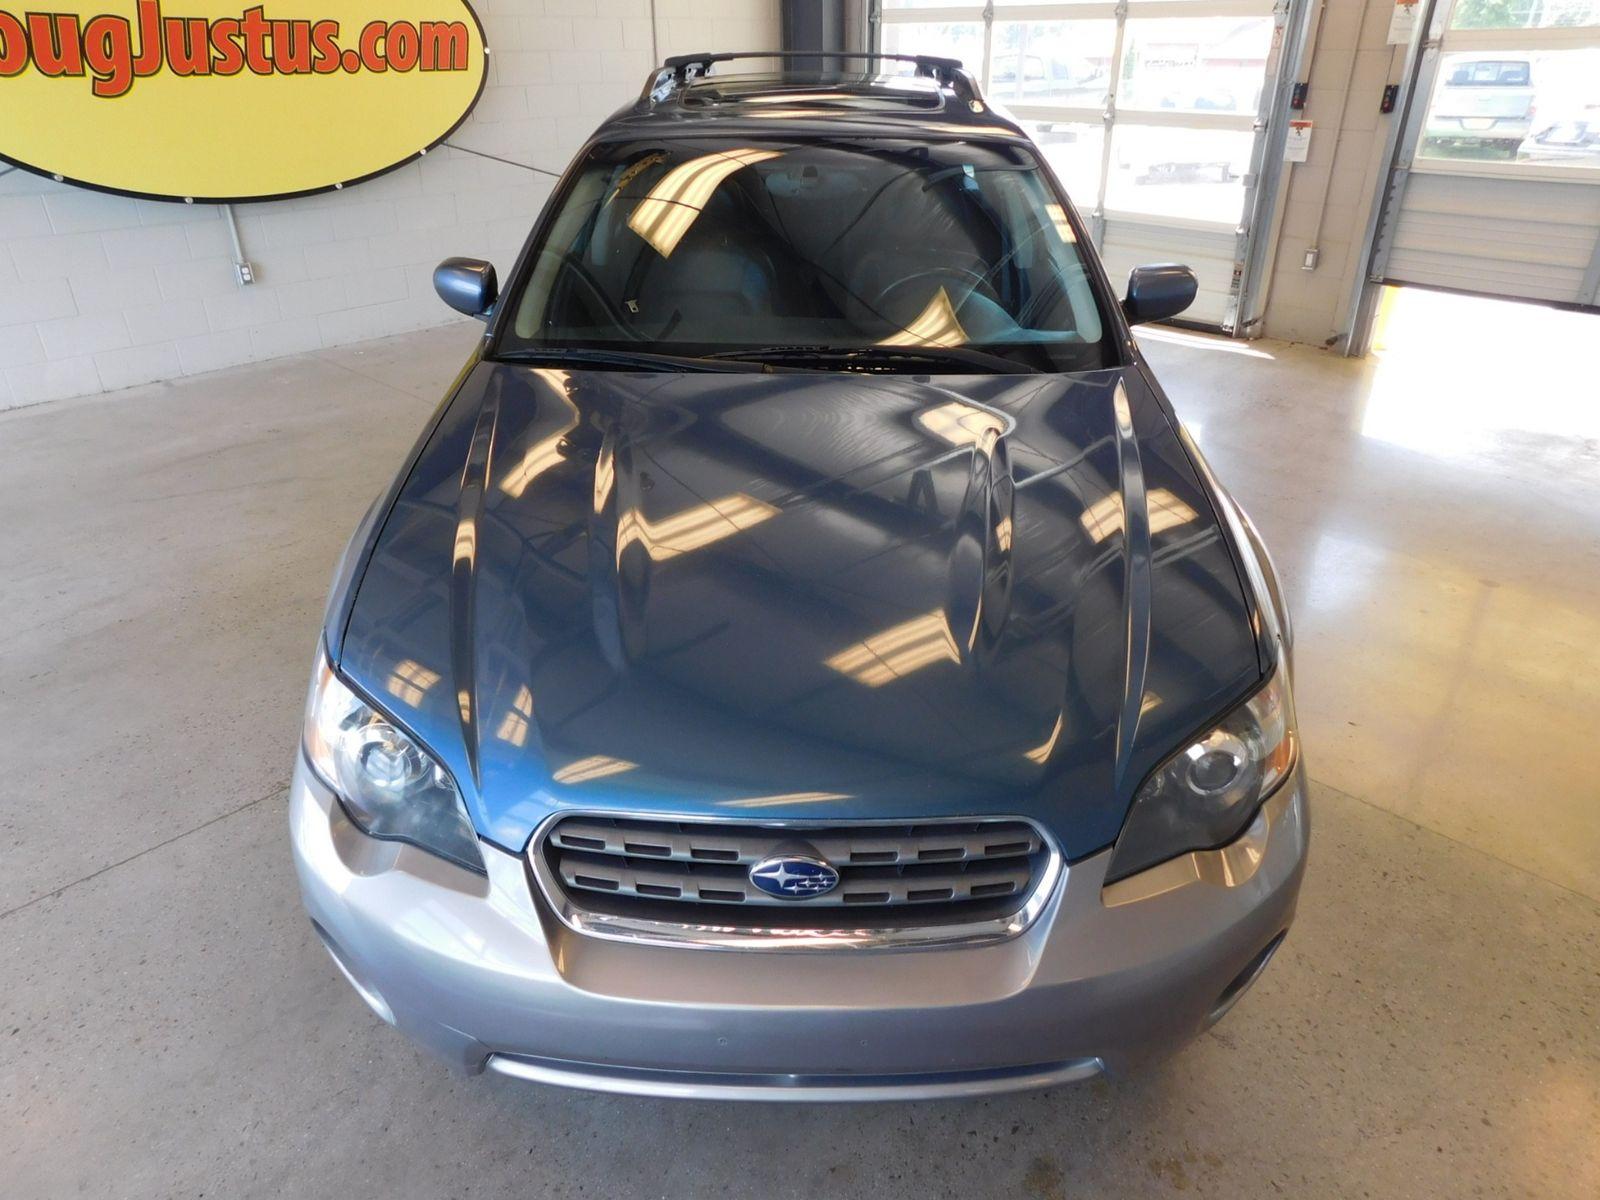 2005 Subaru Outback Ltd New Timing Belt Head Gaskets City Tn Doug Dash Wiring Justus Auto